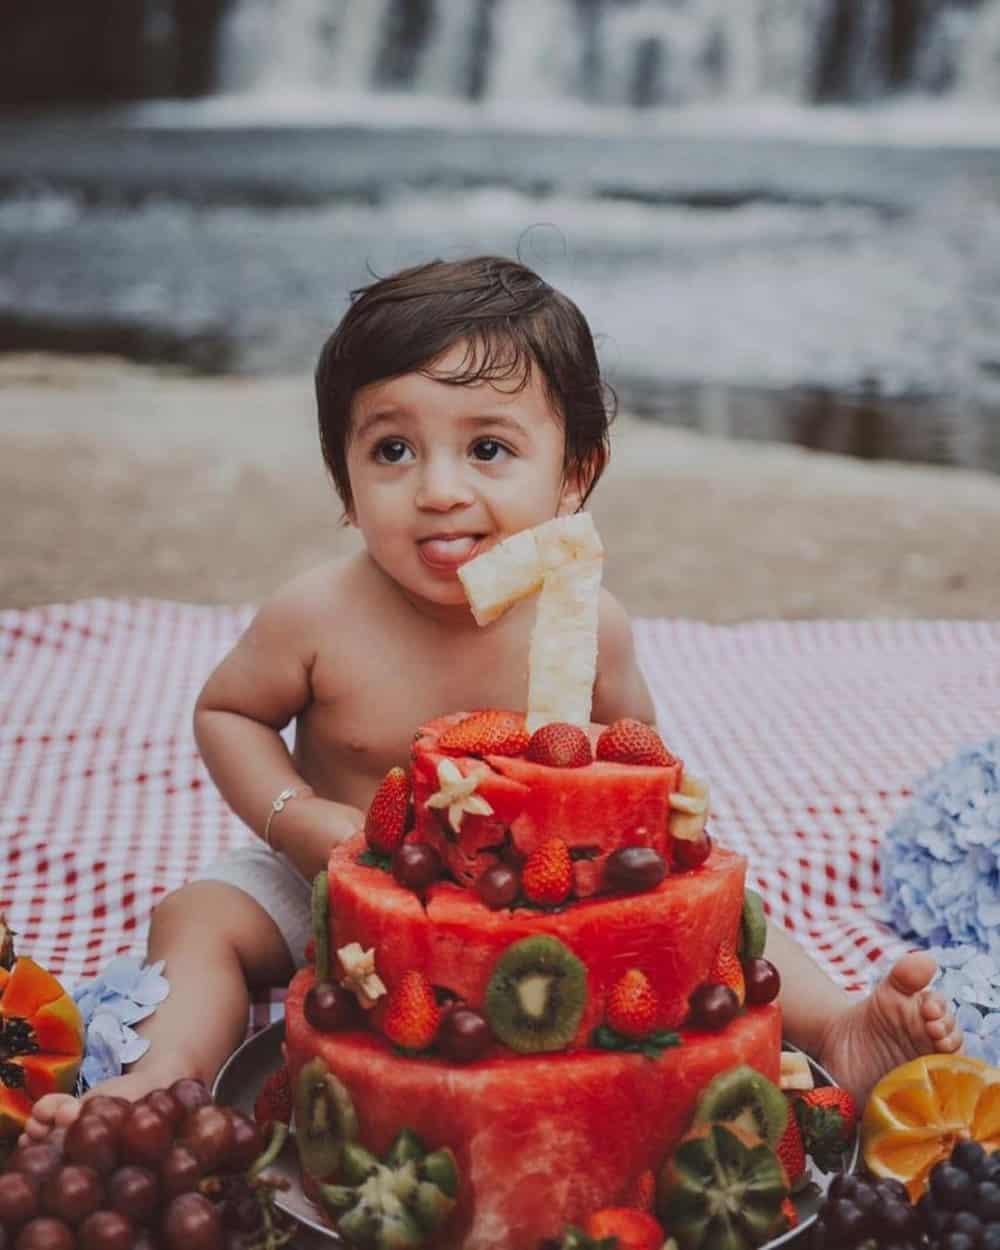 bolo de frutas